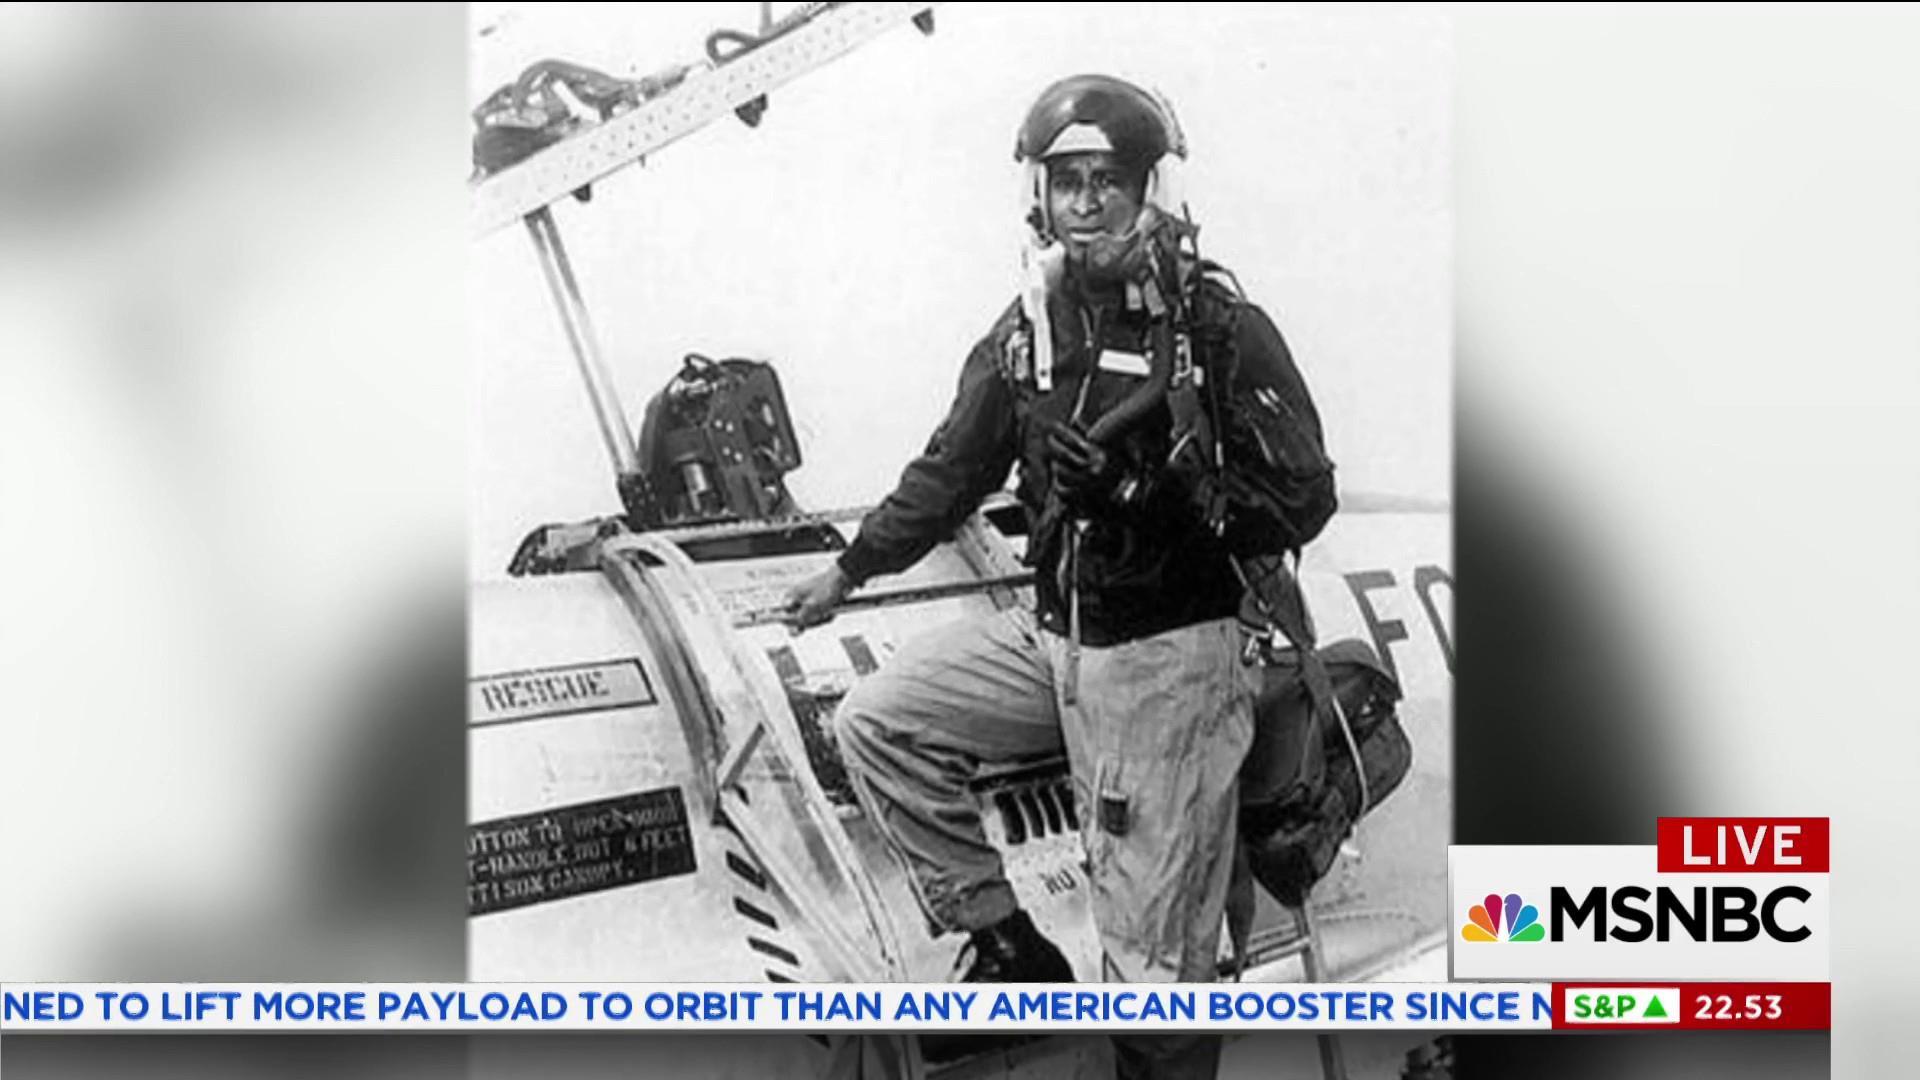 Monumental American: Astronaut Robert Henry Lawrence Junior